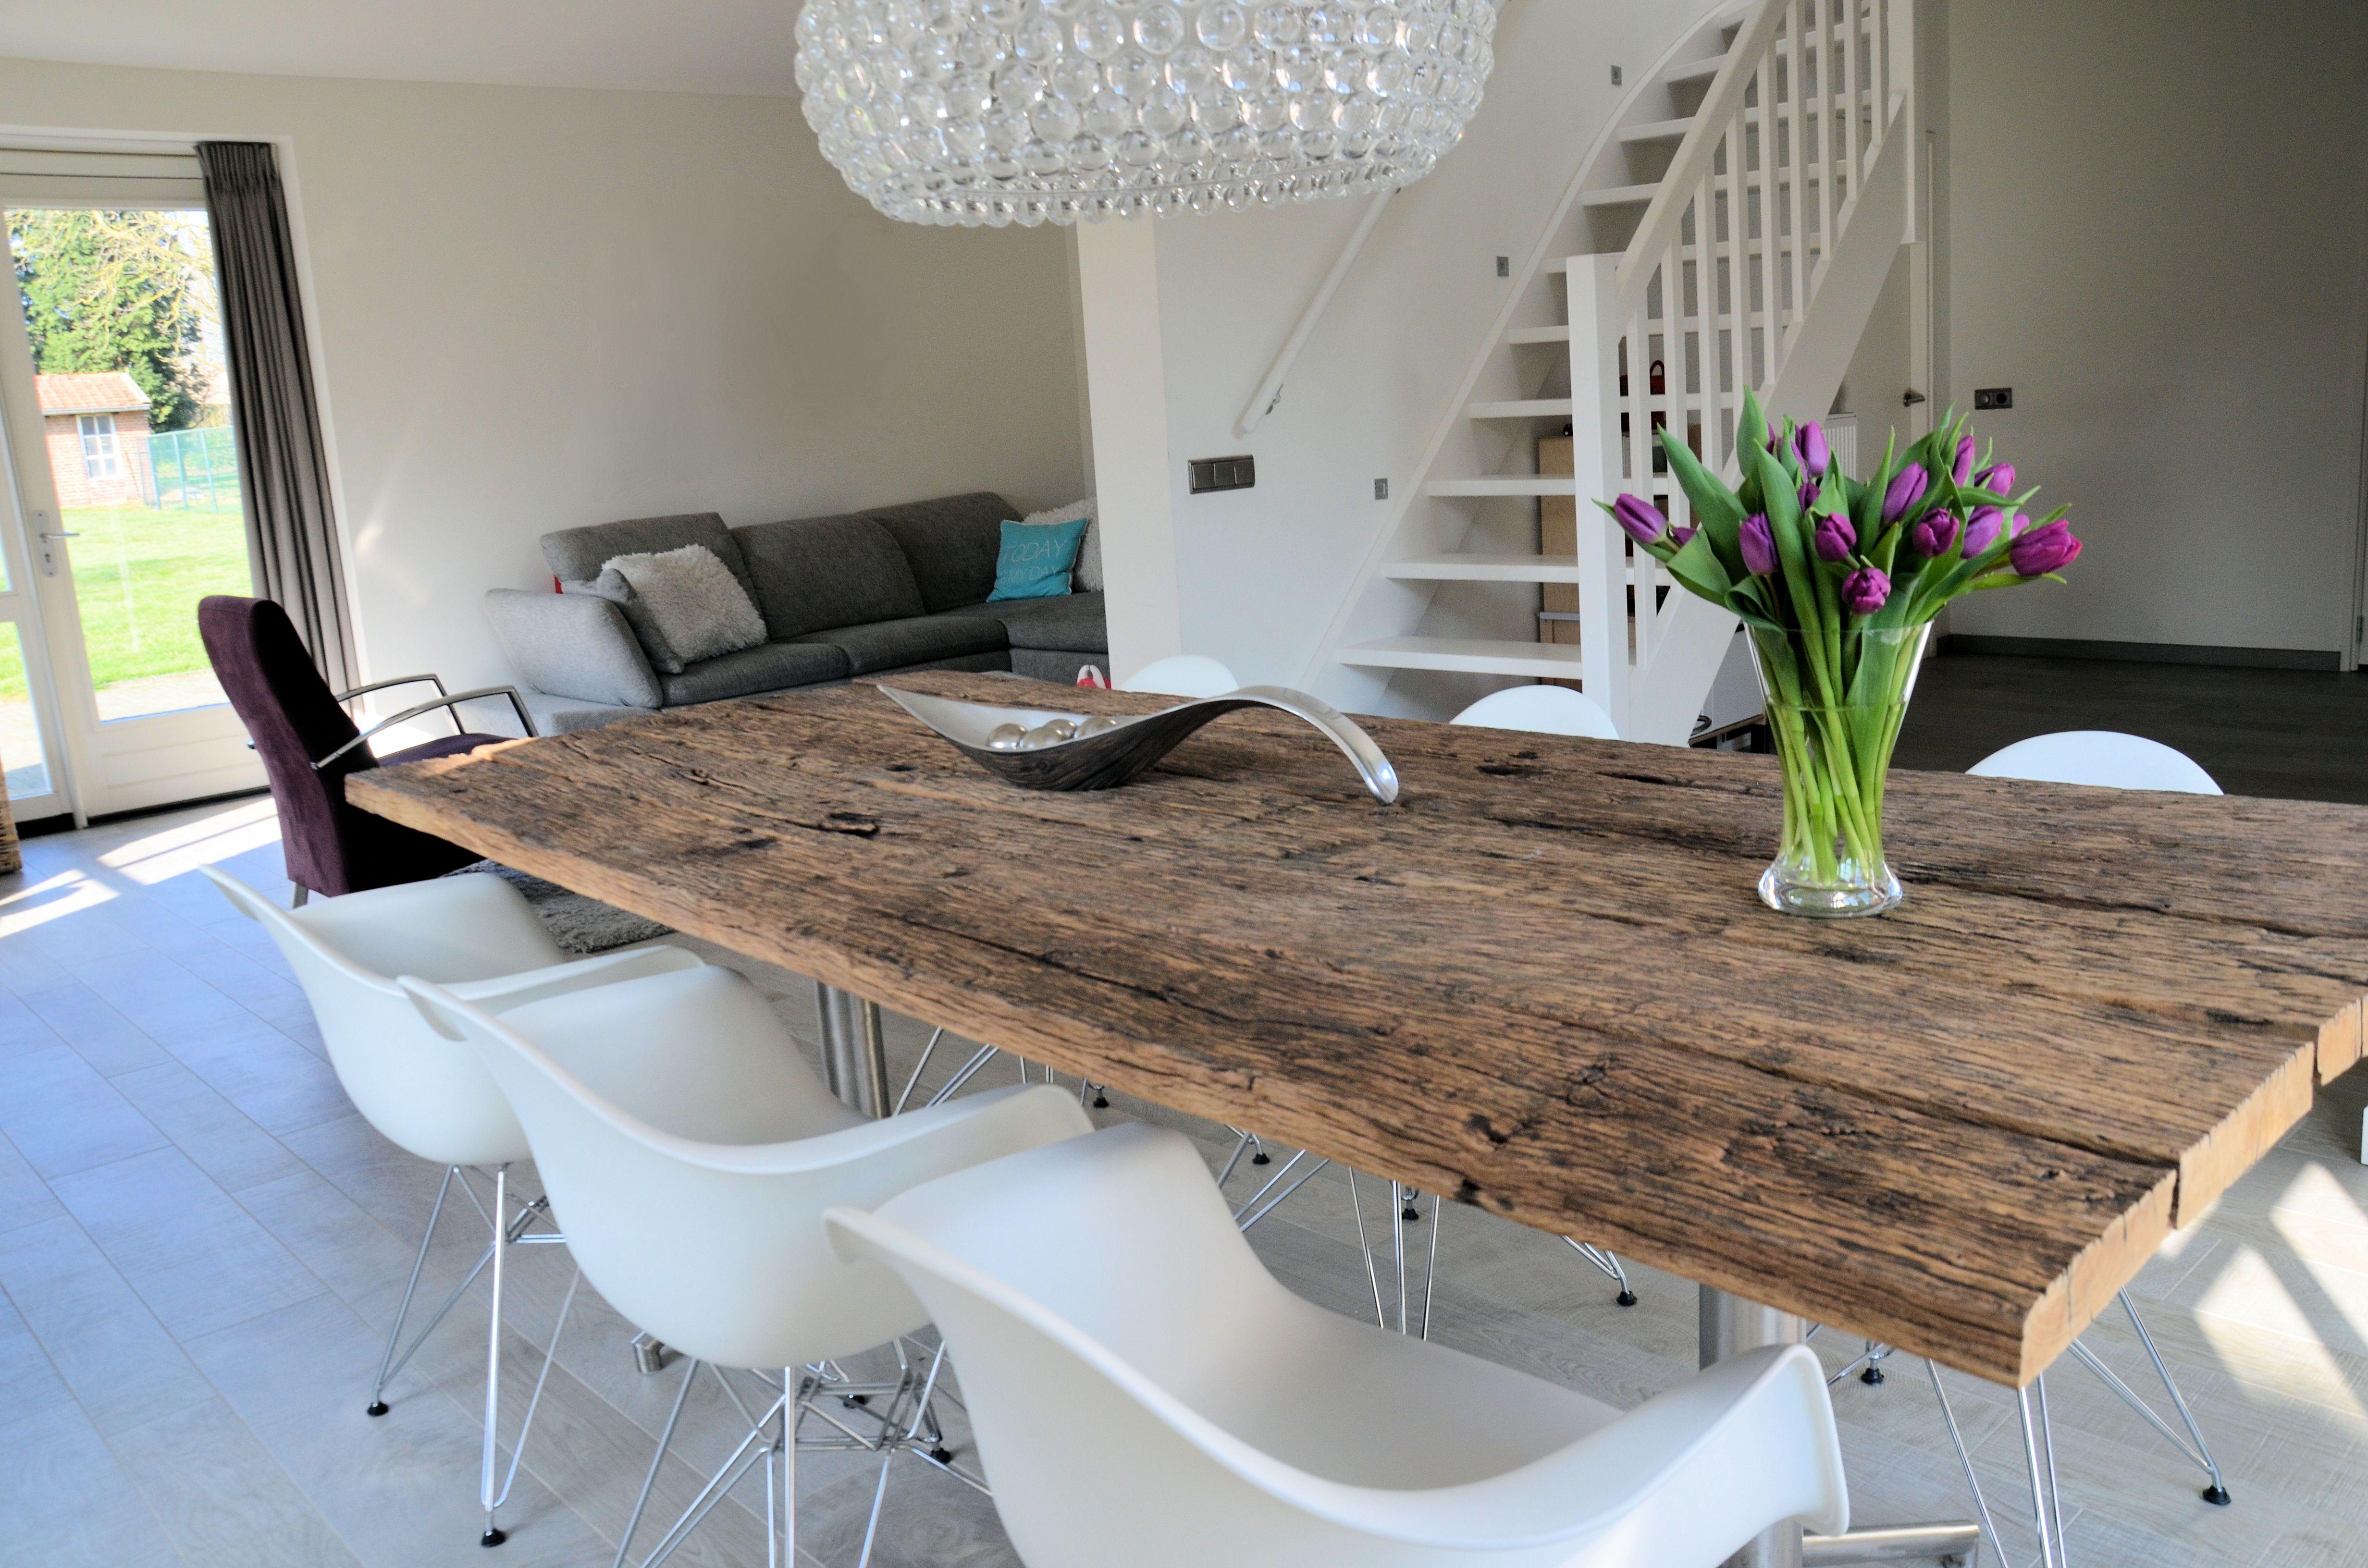 Interieur - Woonkamer - Houten tafel - Modern -Strak ingericht ...